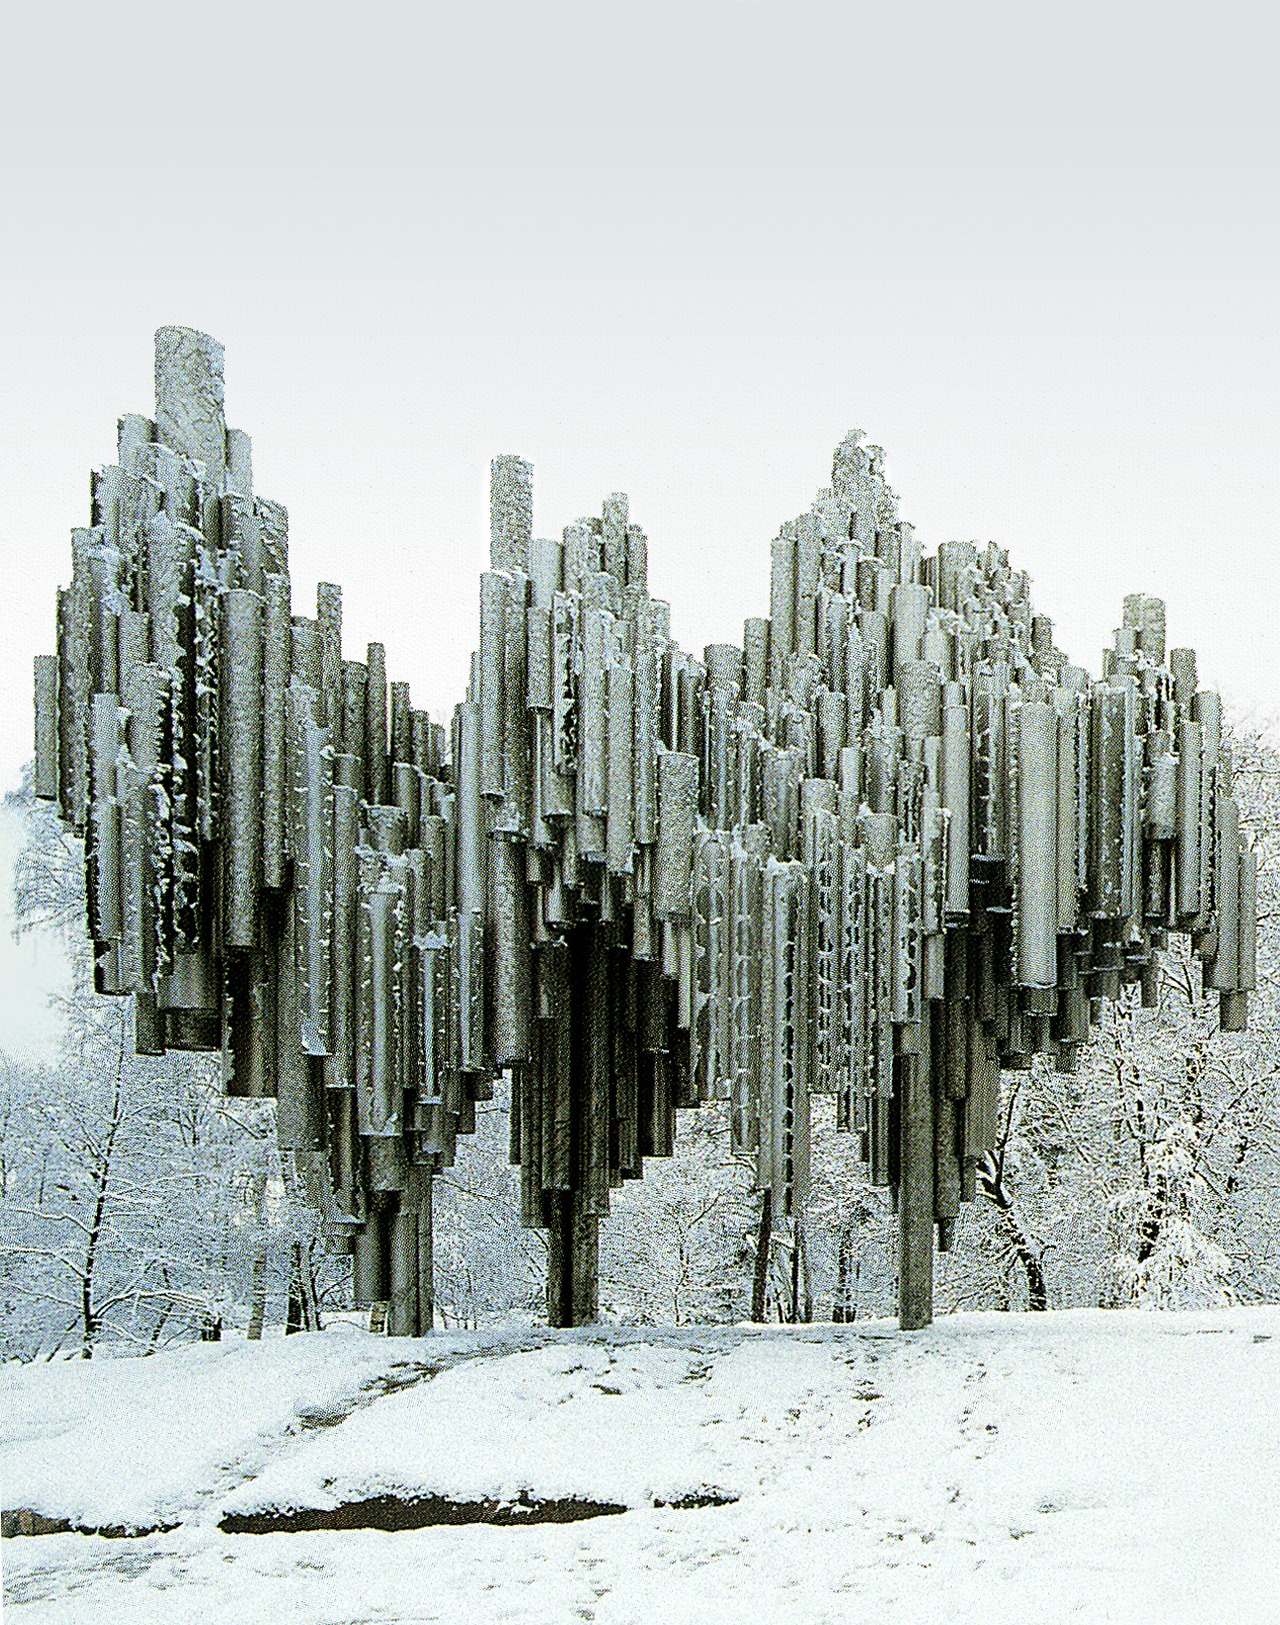 Sibelius Monument by   Eila Hiltunen  (1967) Helsinki.  Emil Kukkonen assistant-metalworker.   Material - Welding stainless steel.  Weight: 30 tons.  1   2  3